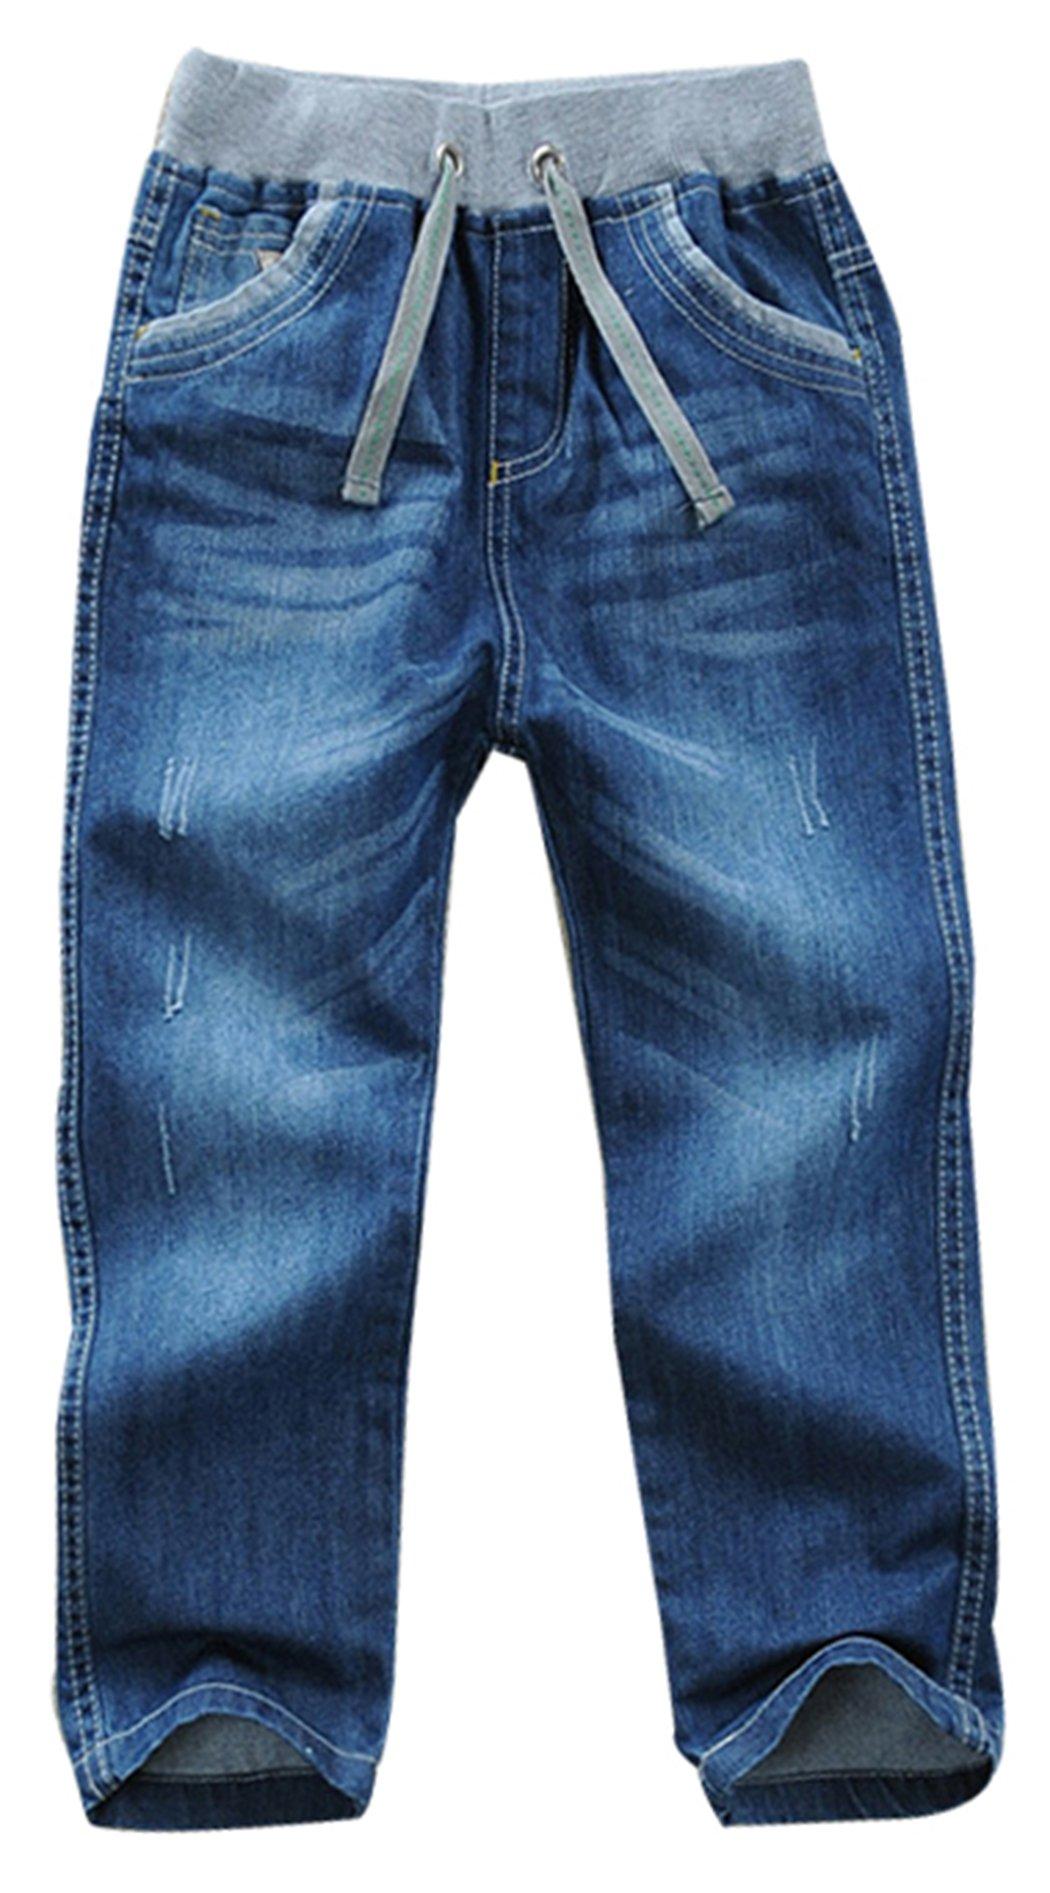 Toddler Youth Boy Washed Elastic Mid Waist Full Length Regular Pants Denim Jeans(B,3 Years)